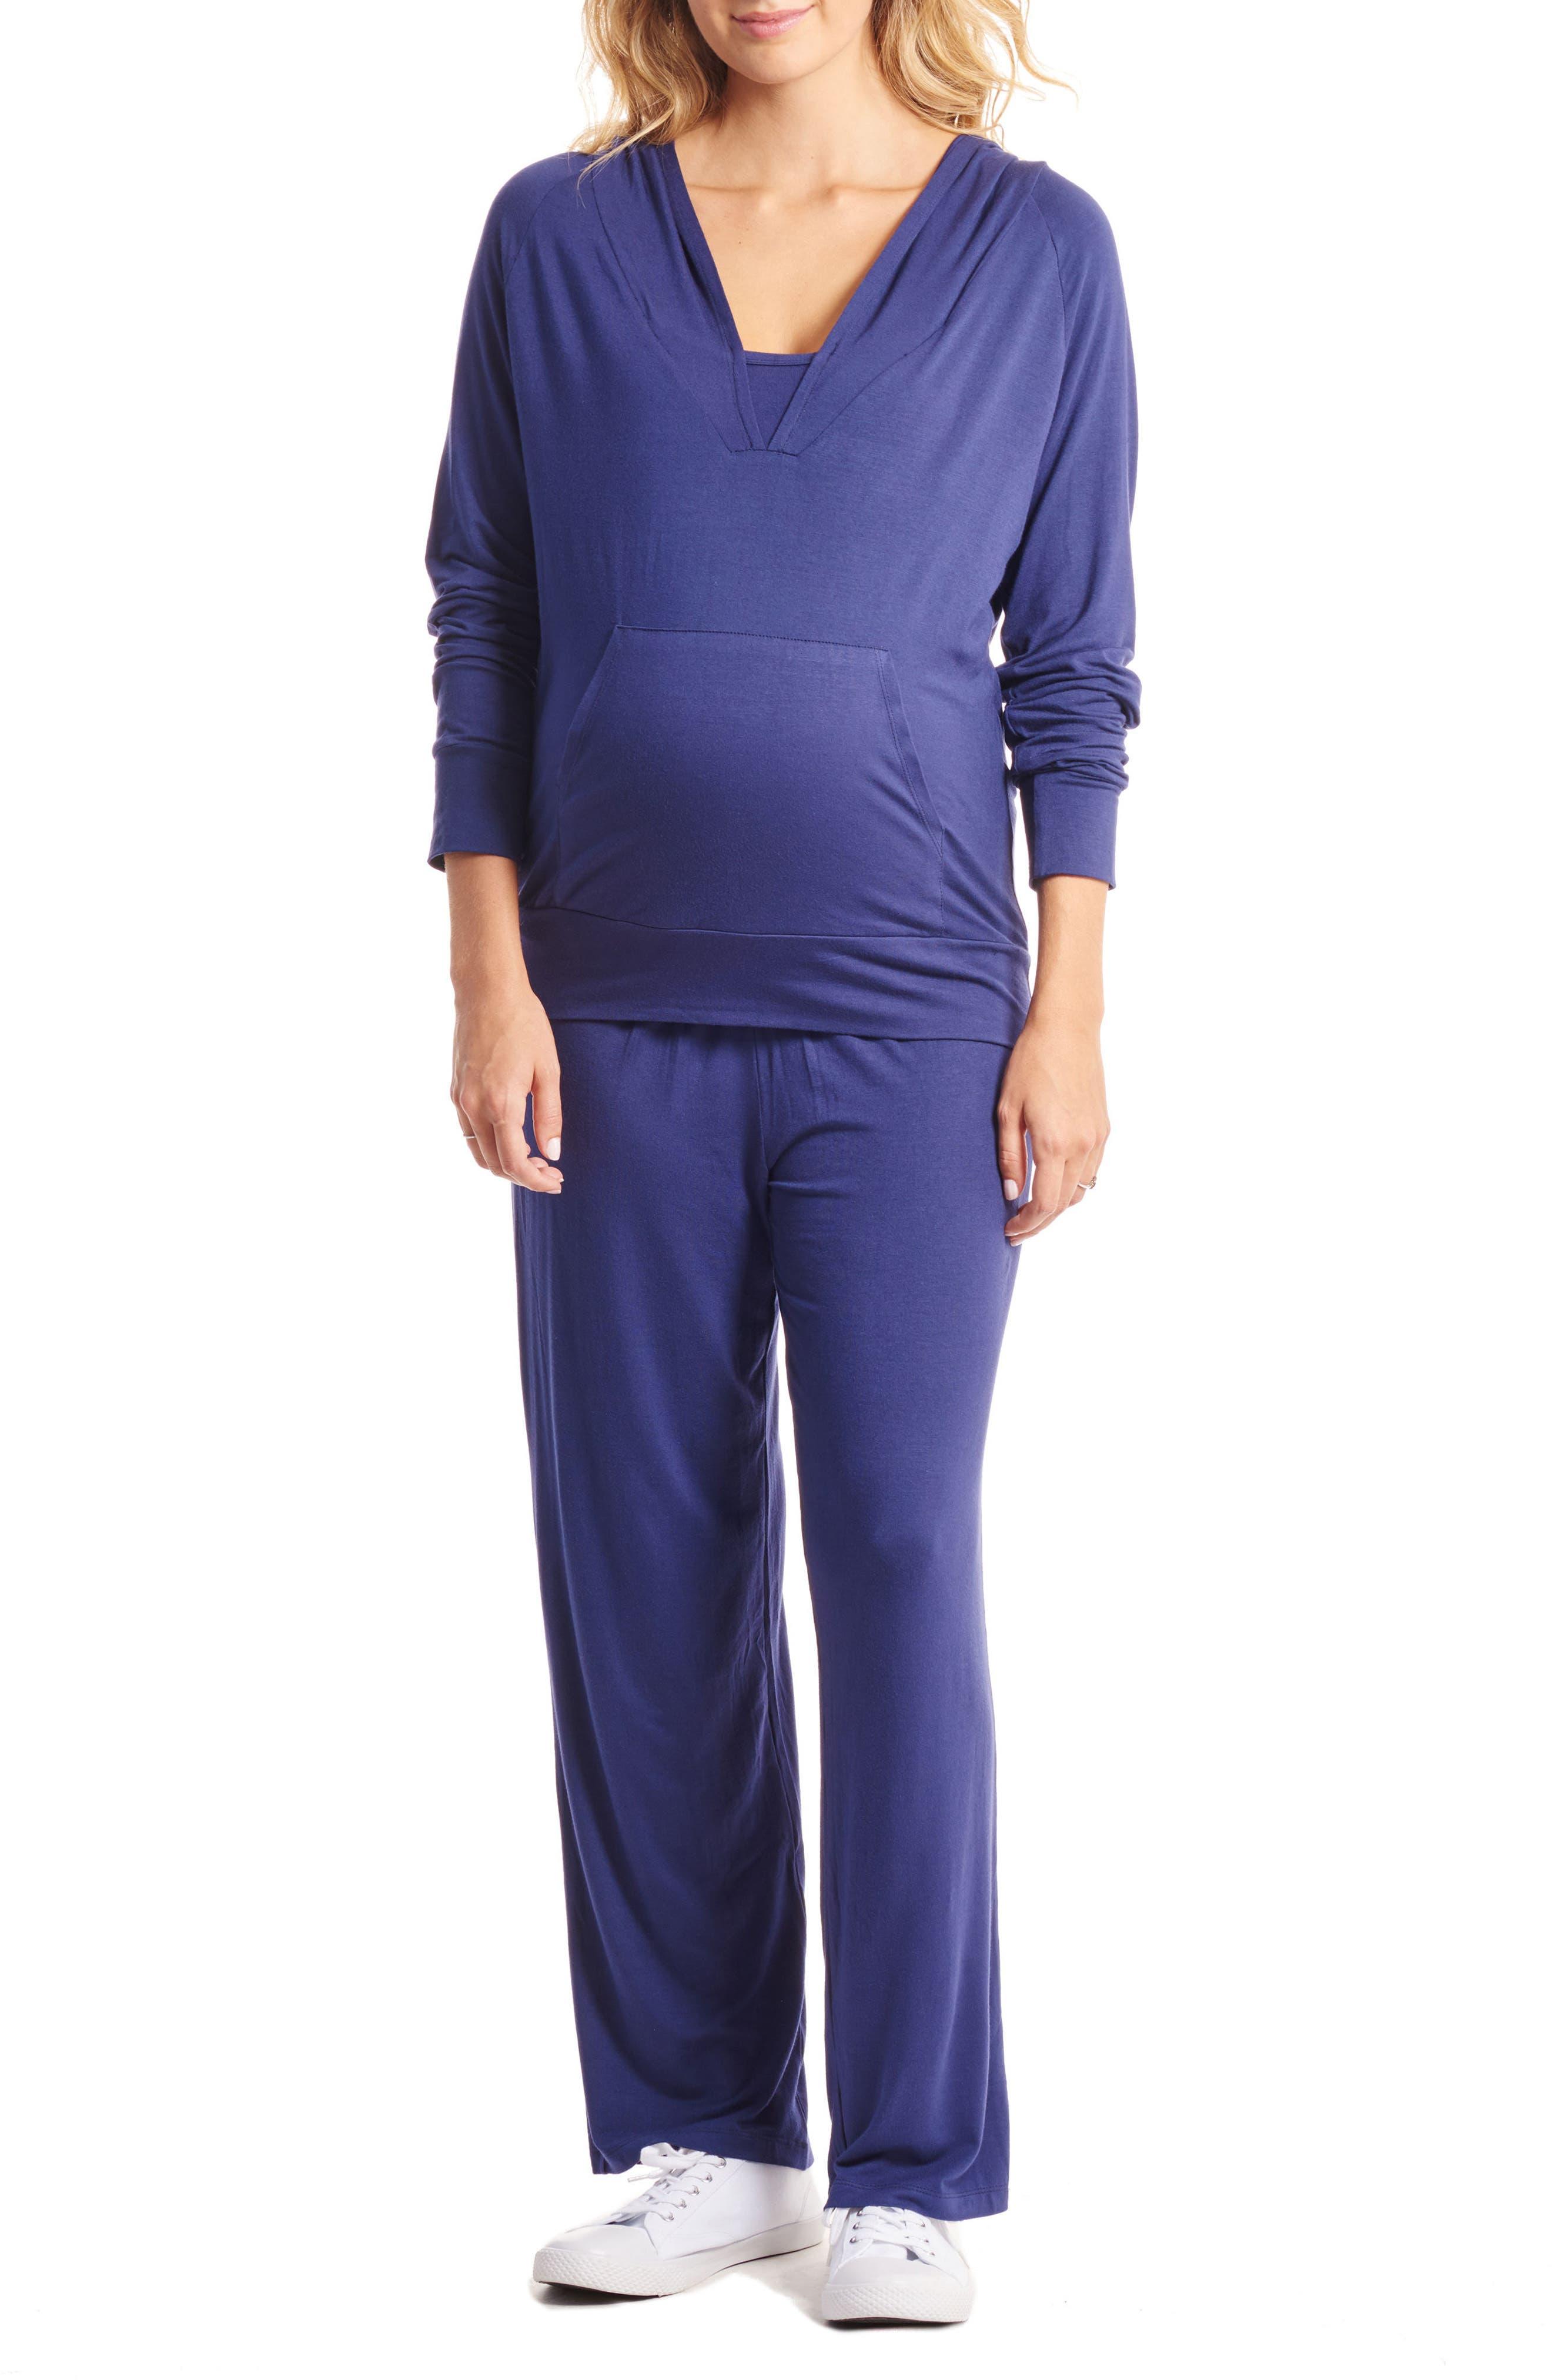 Irene Maternity/Nursing Hoodie & Pants Set,                             Alternate thumbnail 6, color,                             Navy